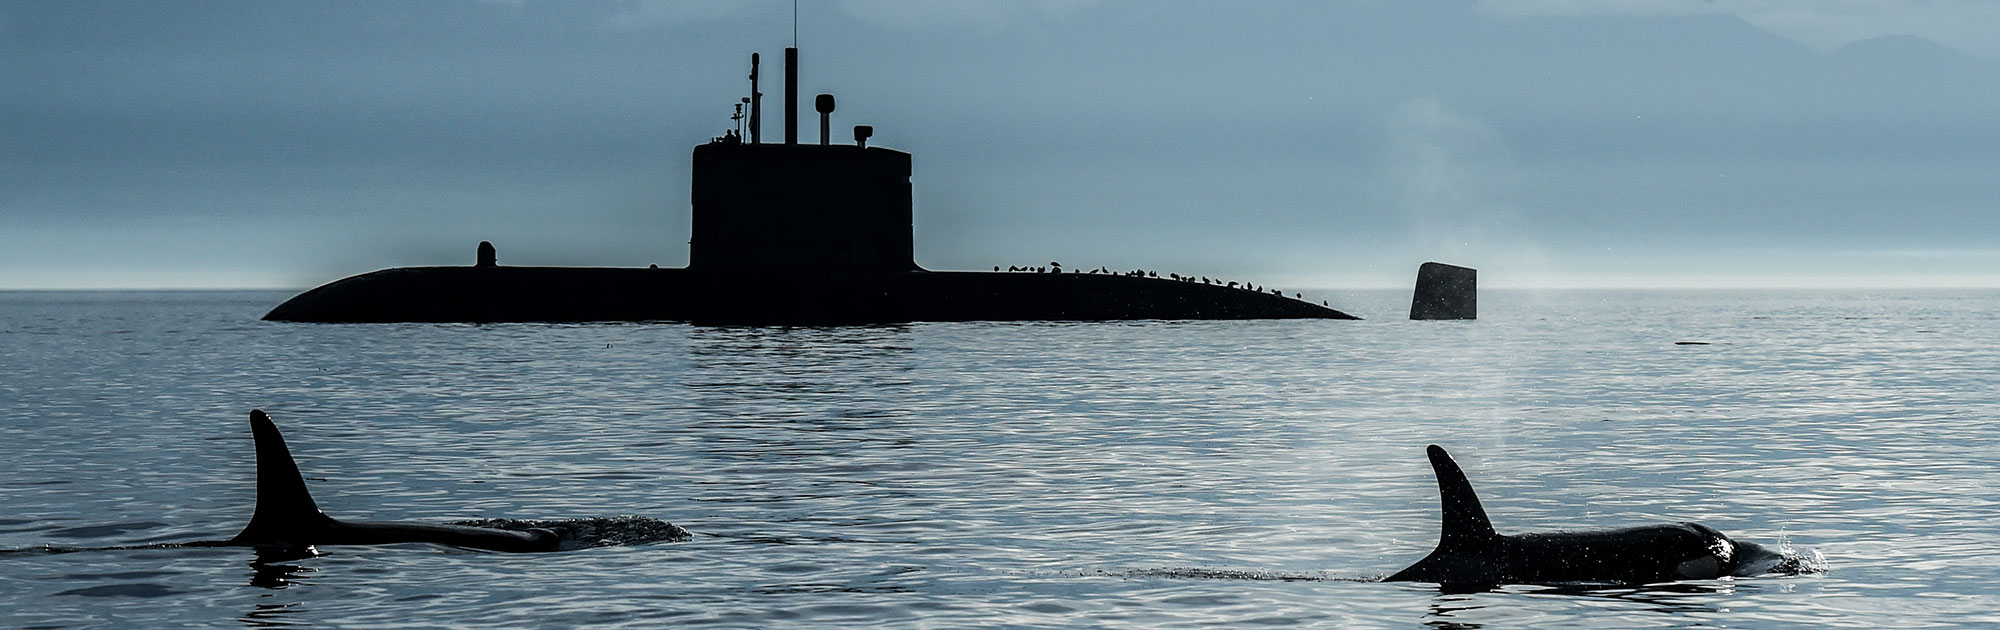 E3DT Submarine